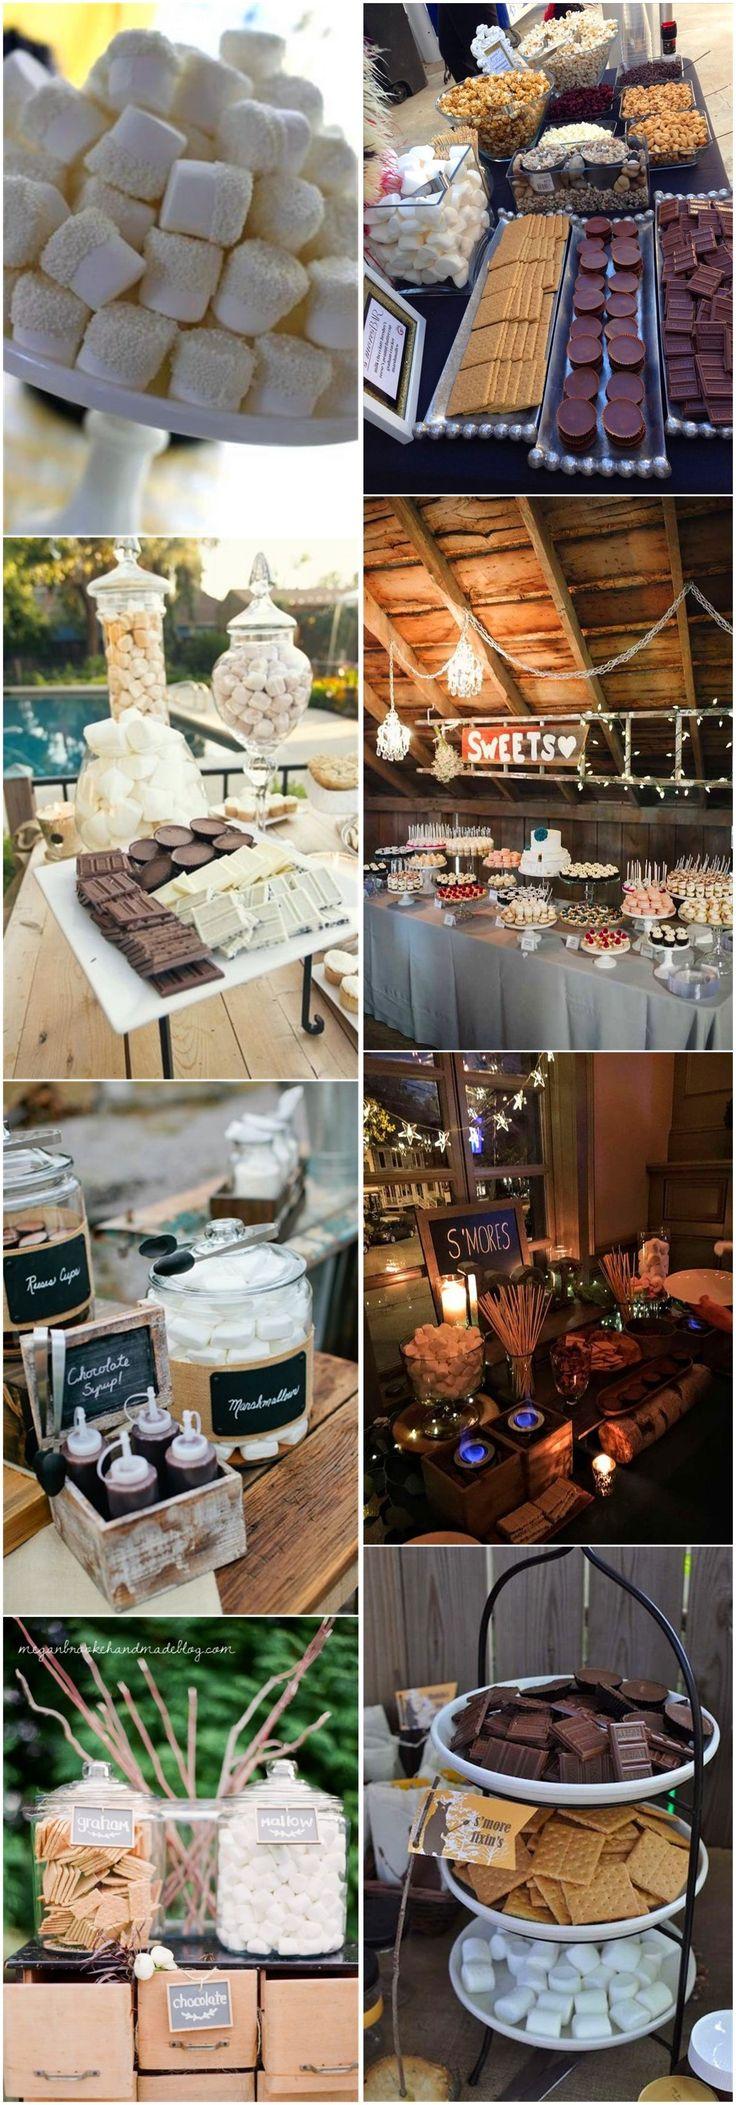 Best Wedding Reception Images On Pinterest Wedding Menu